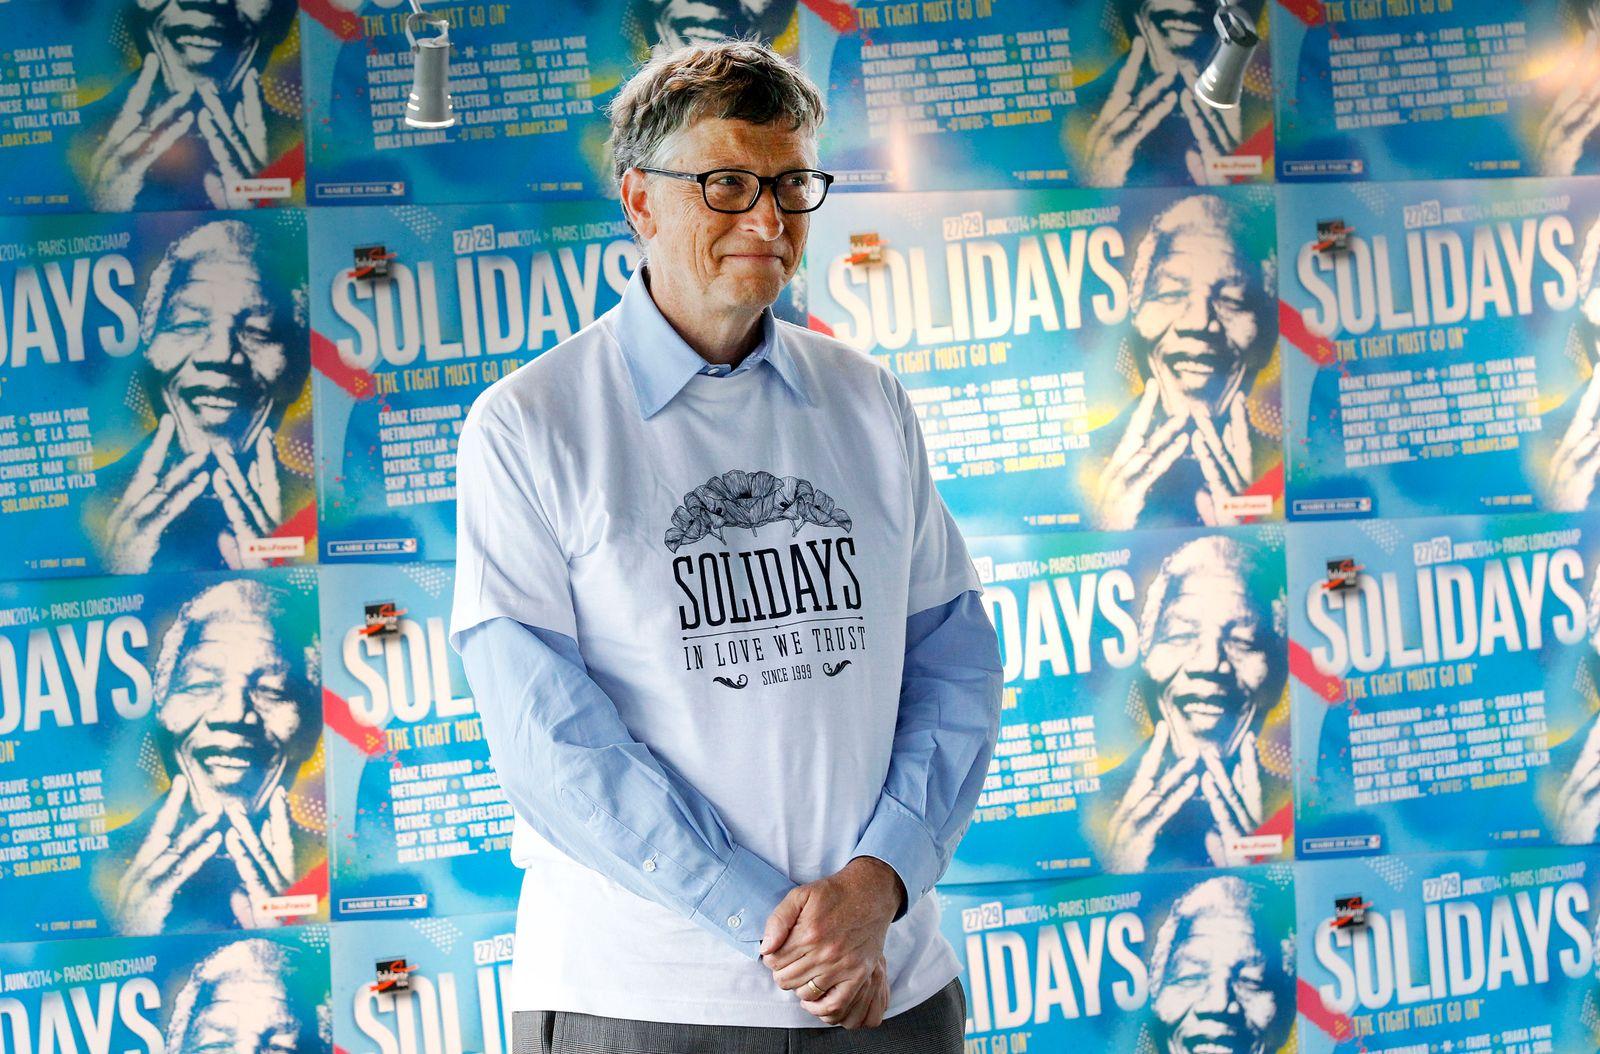 enorm / enorm / Bill & Melinda Gates Foundation